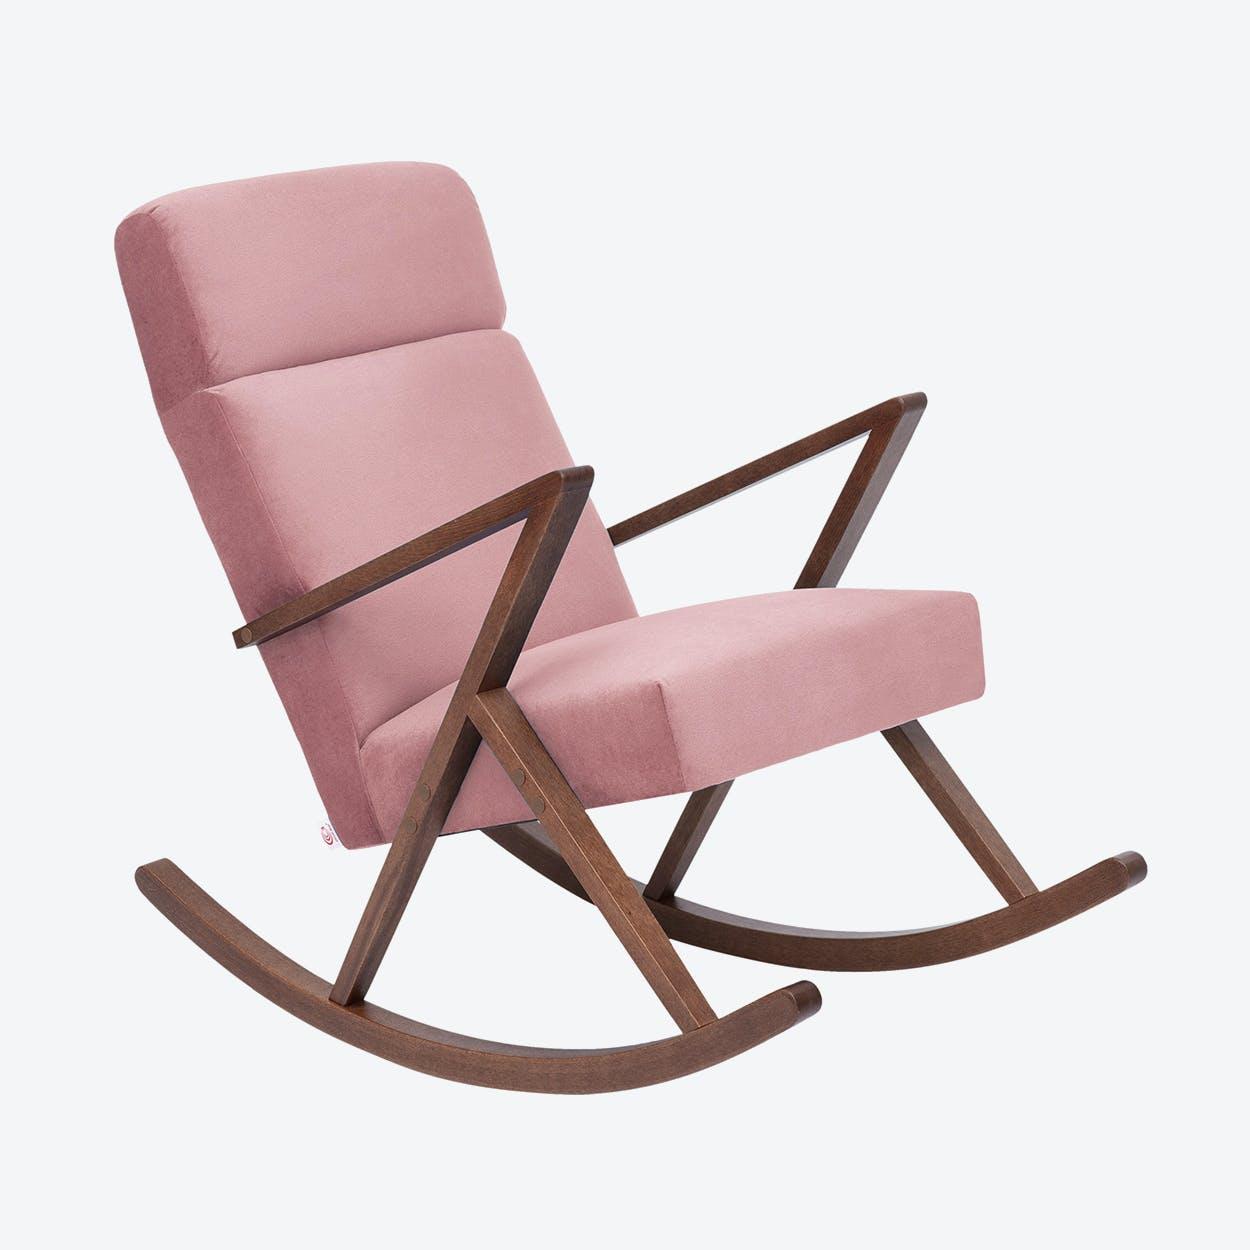 Retrostar Lounge Rocker - Velvet-Line in Vintage-Pink